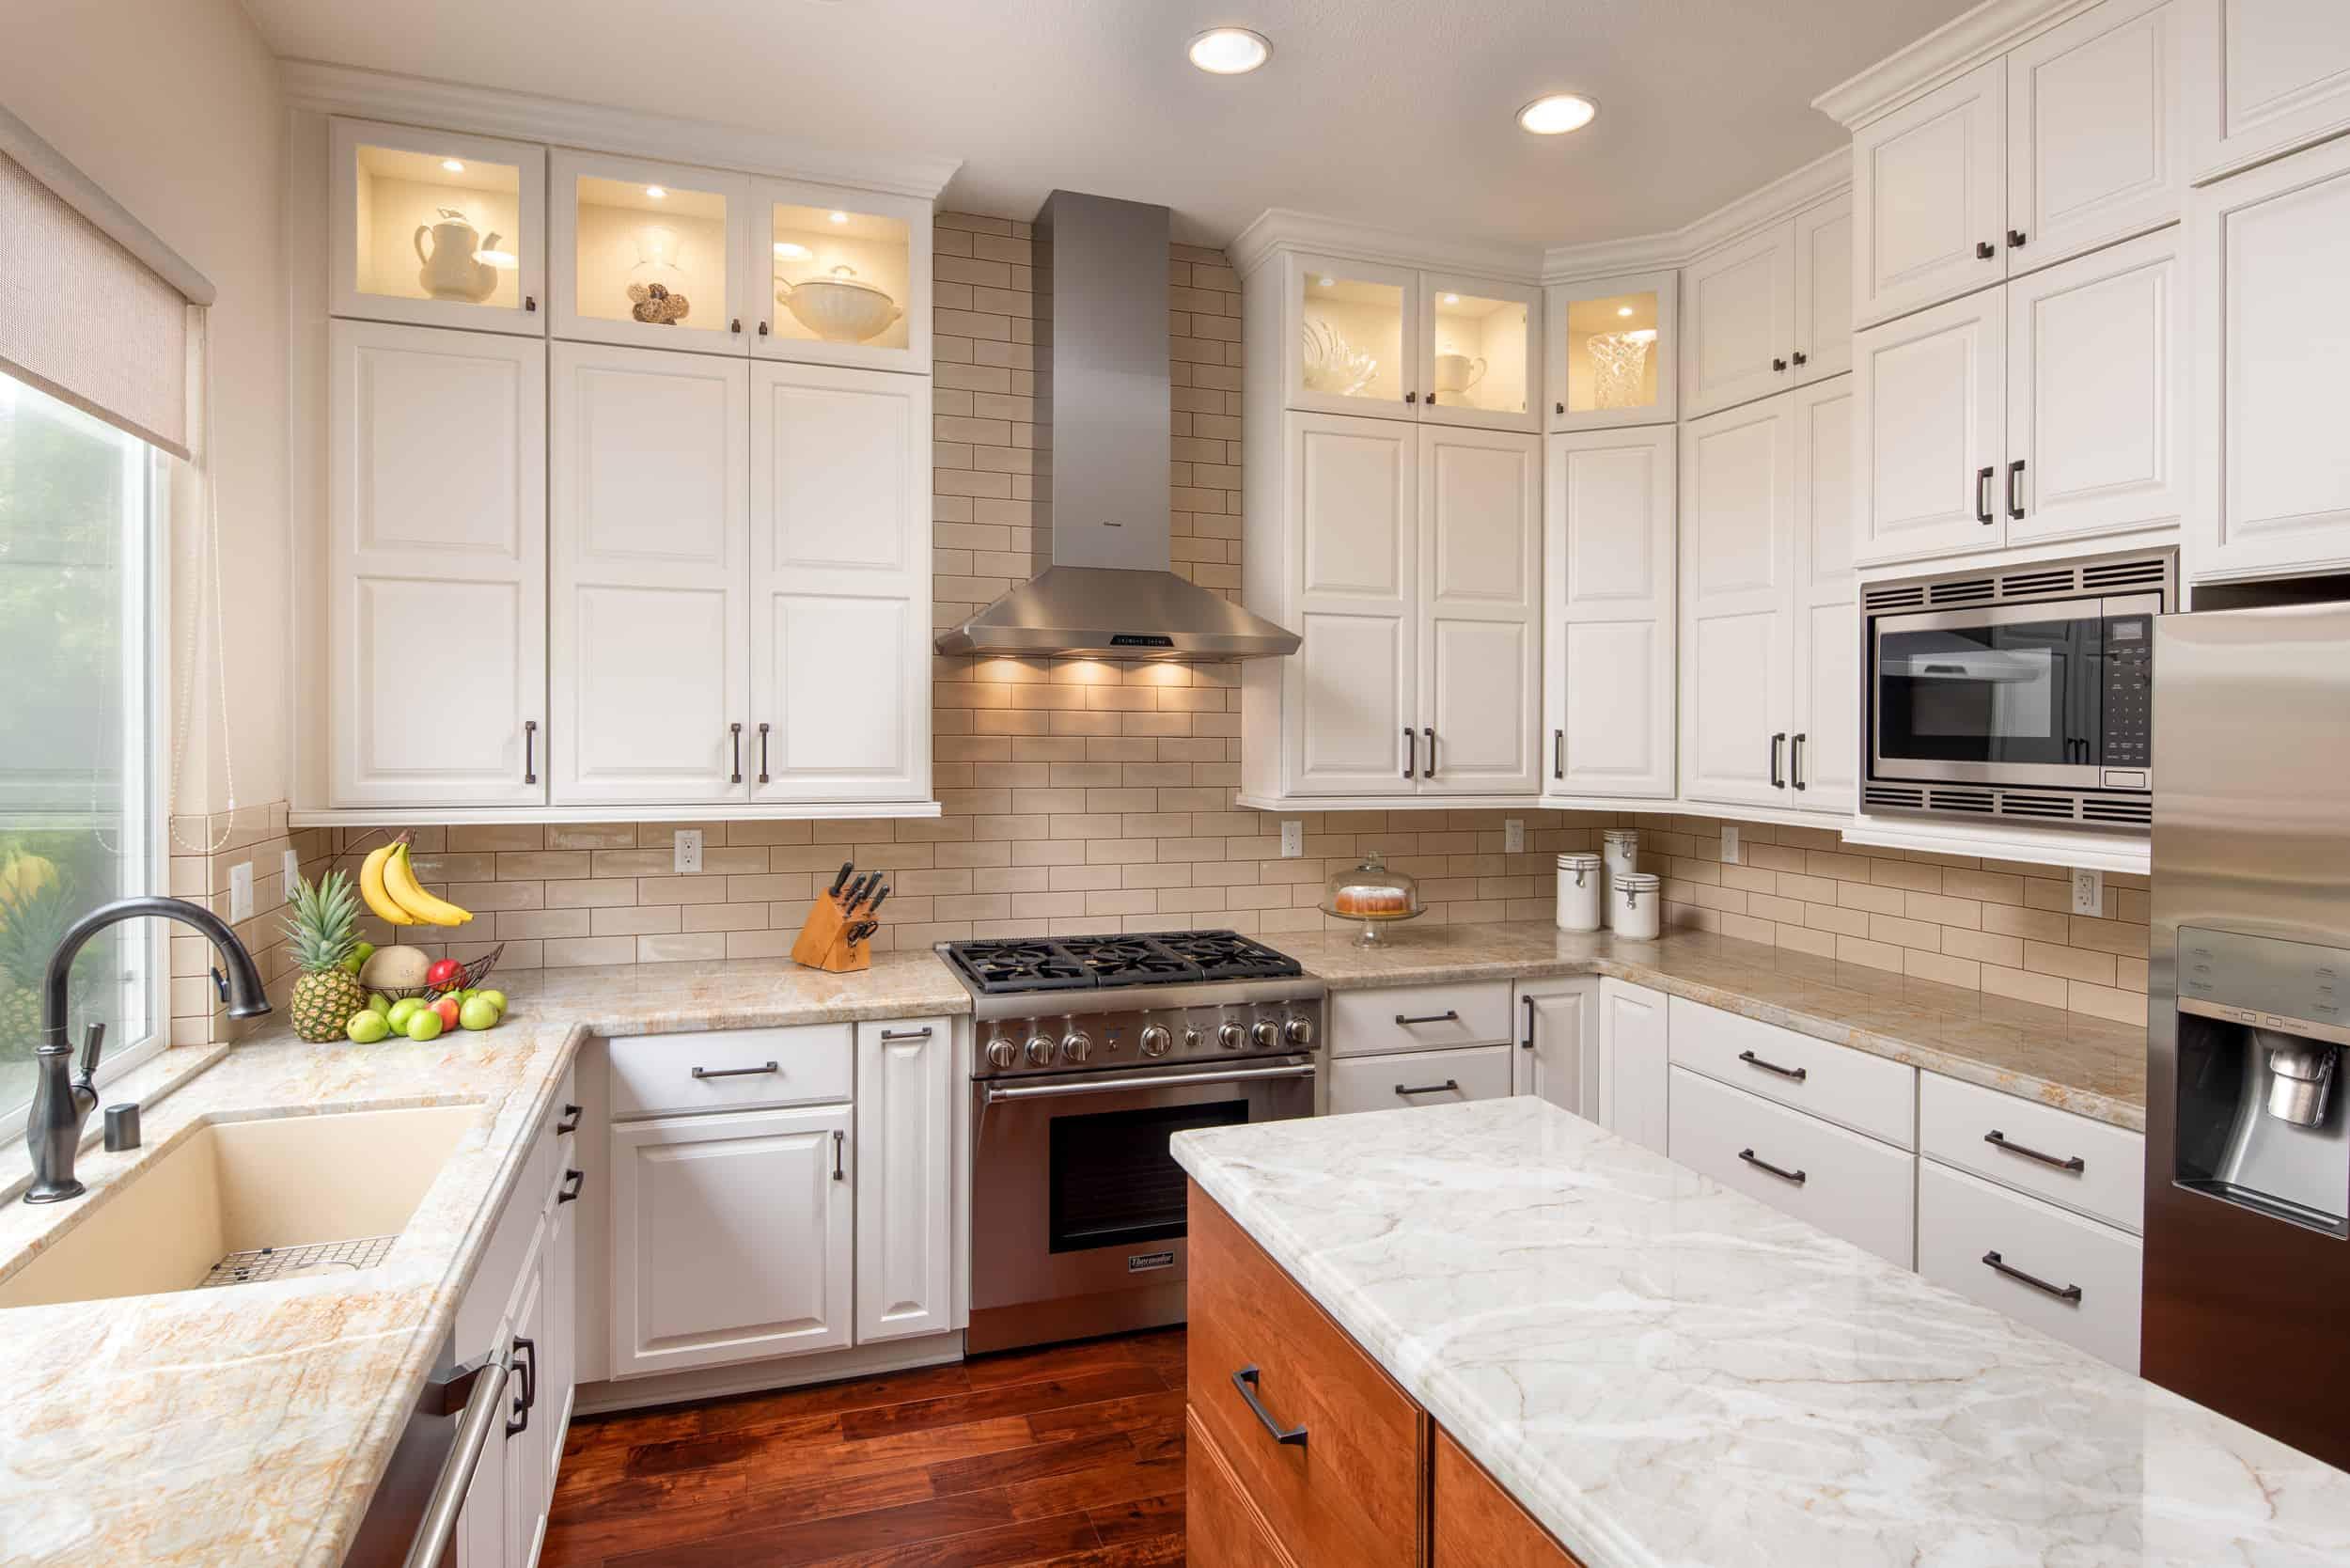 kitchen remodeling ideas & renovation gallery | remodel works